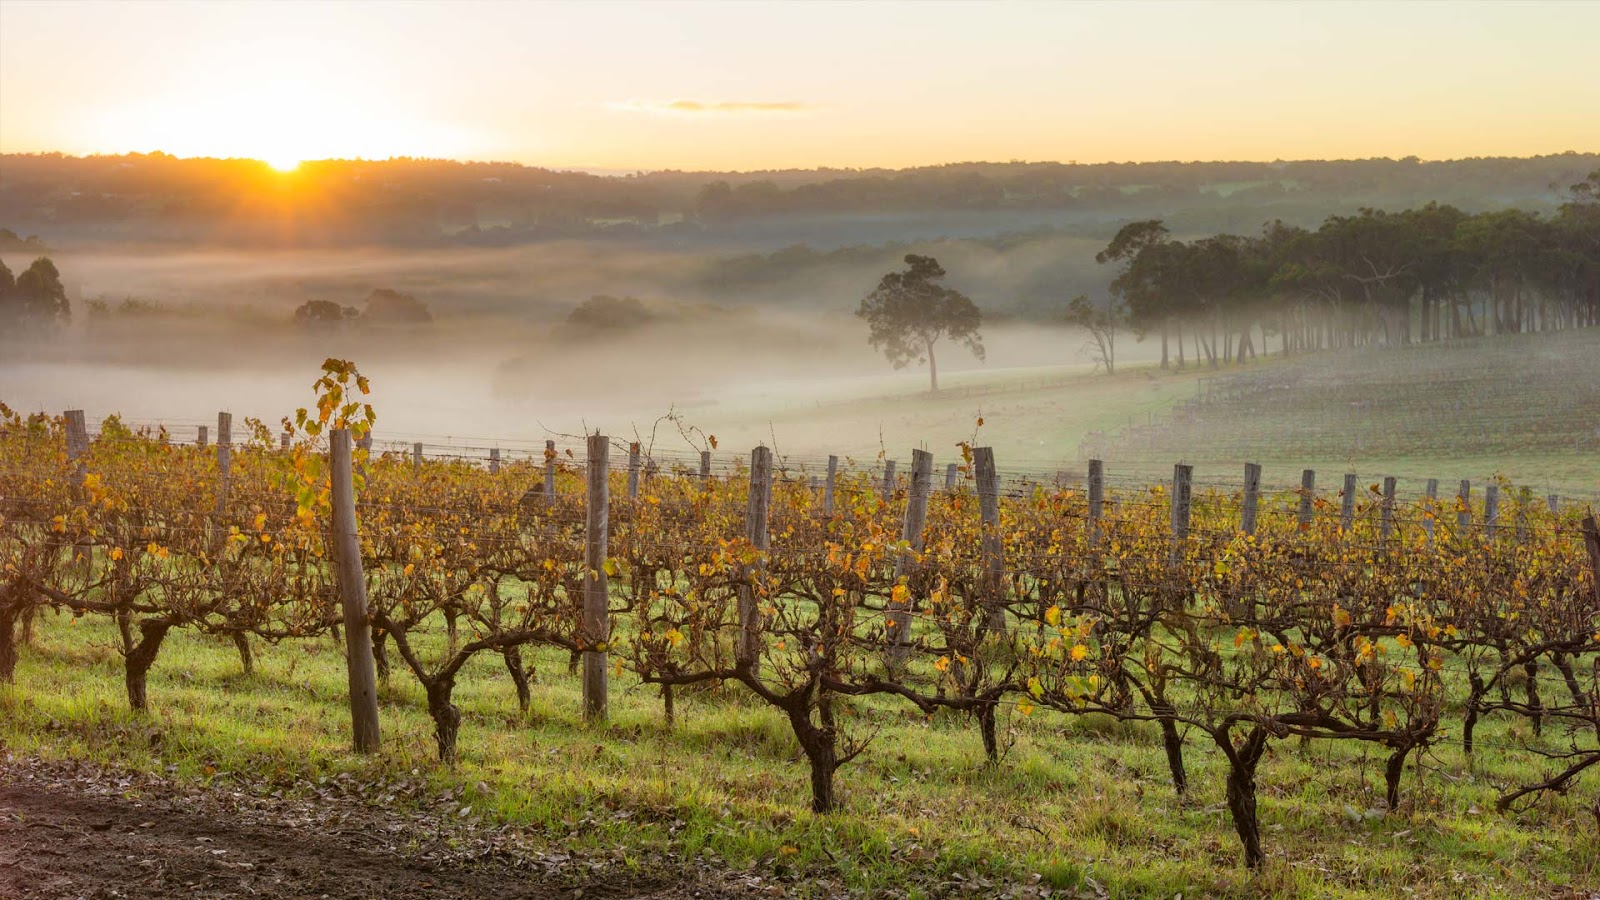 Dawn in the vineyards near Margaret River, Australia © Nick Rains/Corbis NX/Getty Images